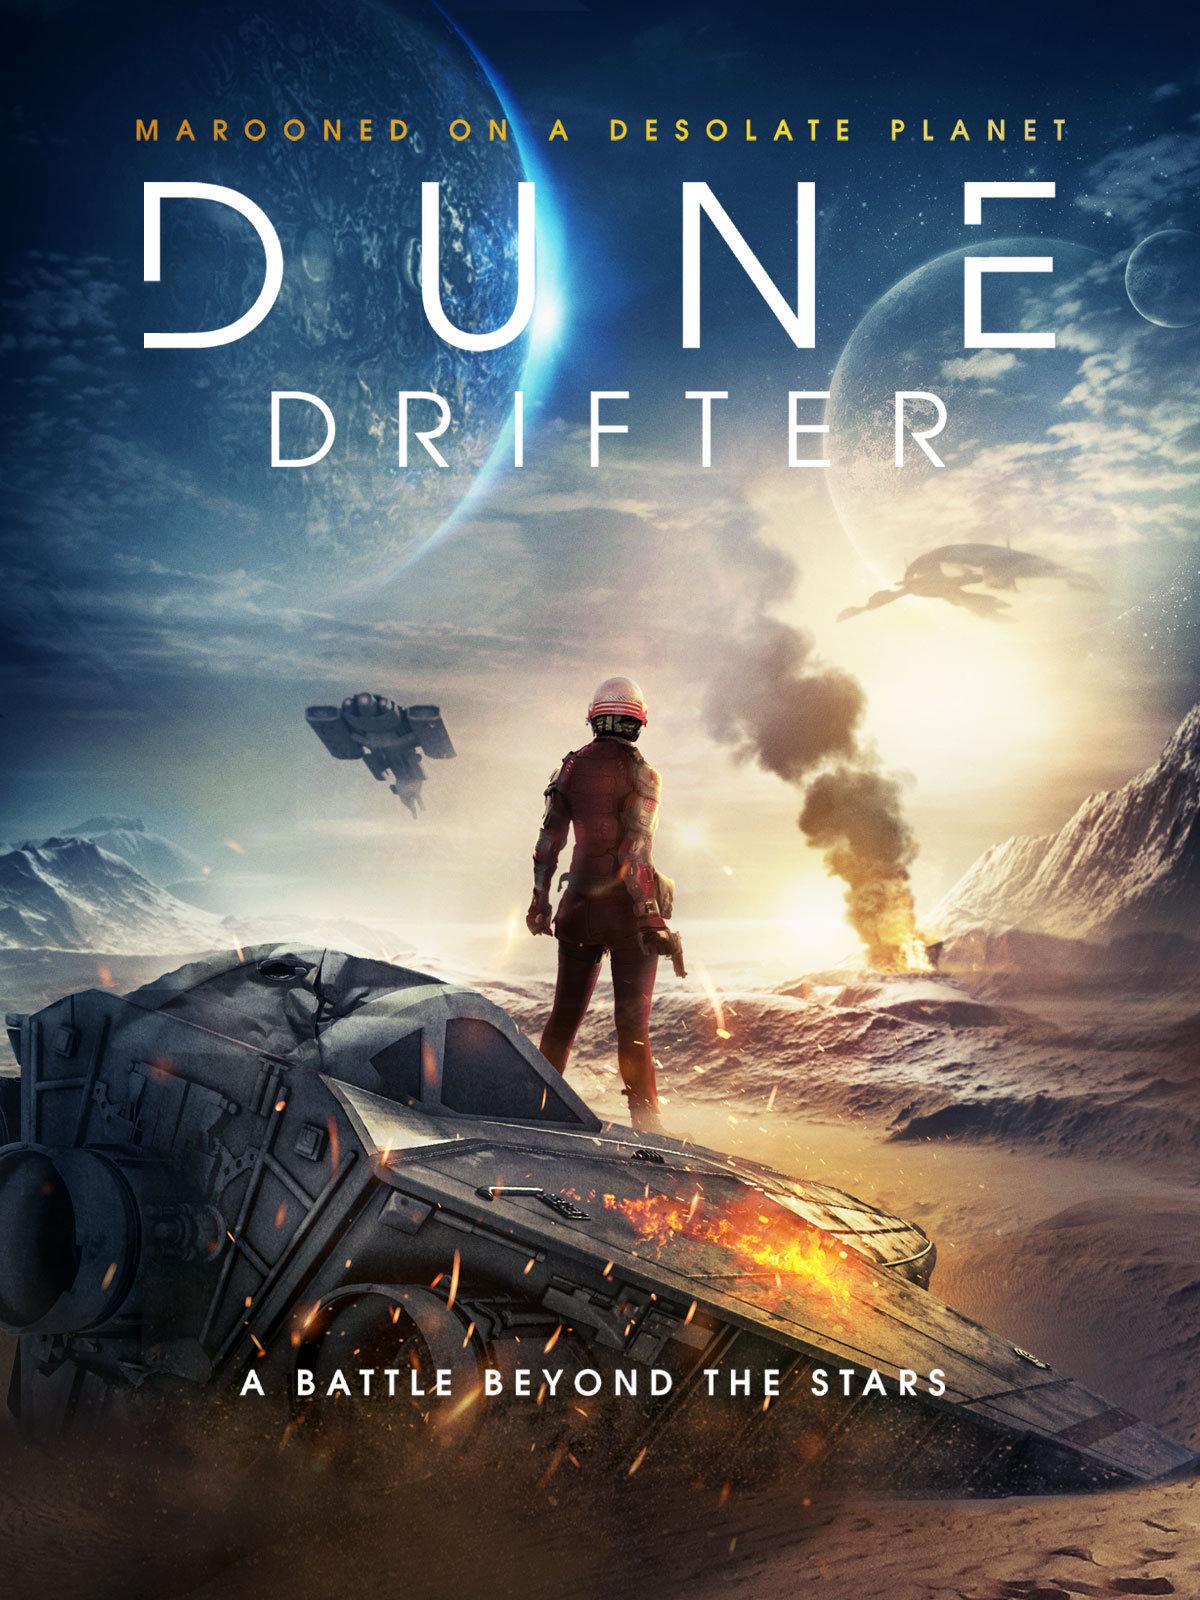 Dune Drifter (2020) poster image